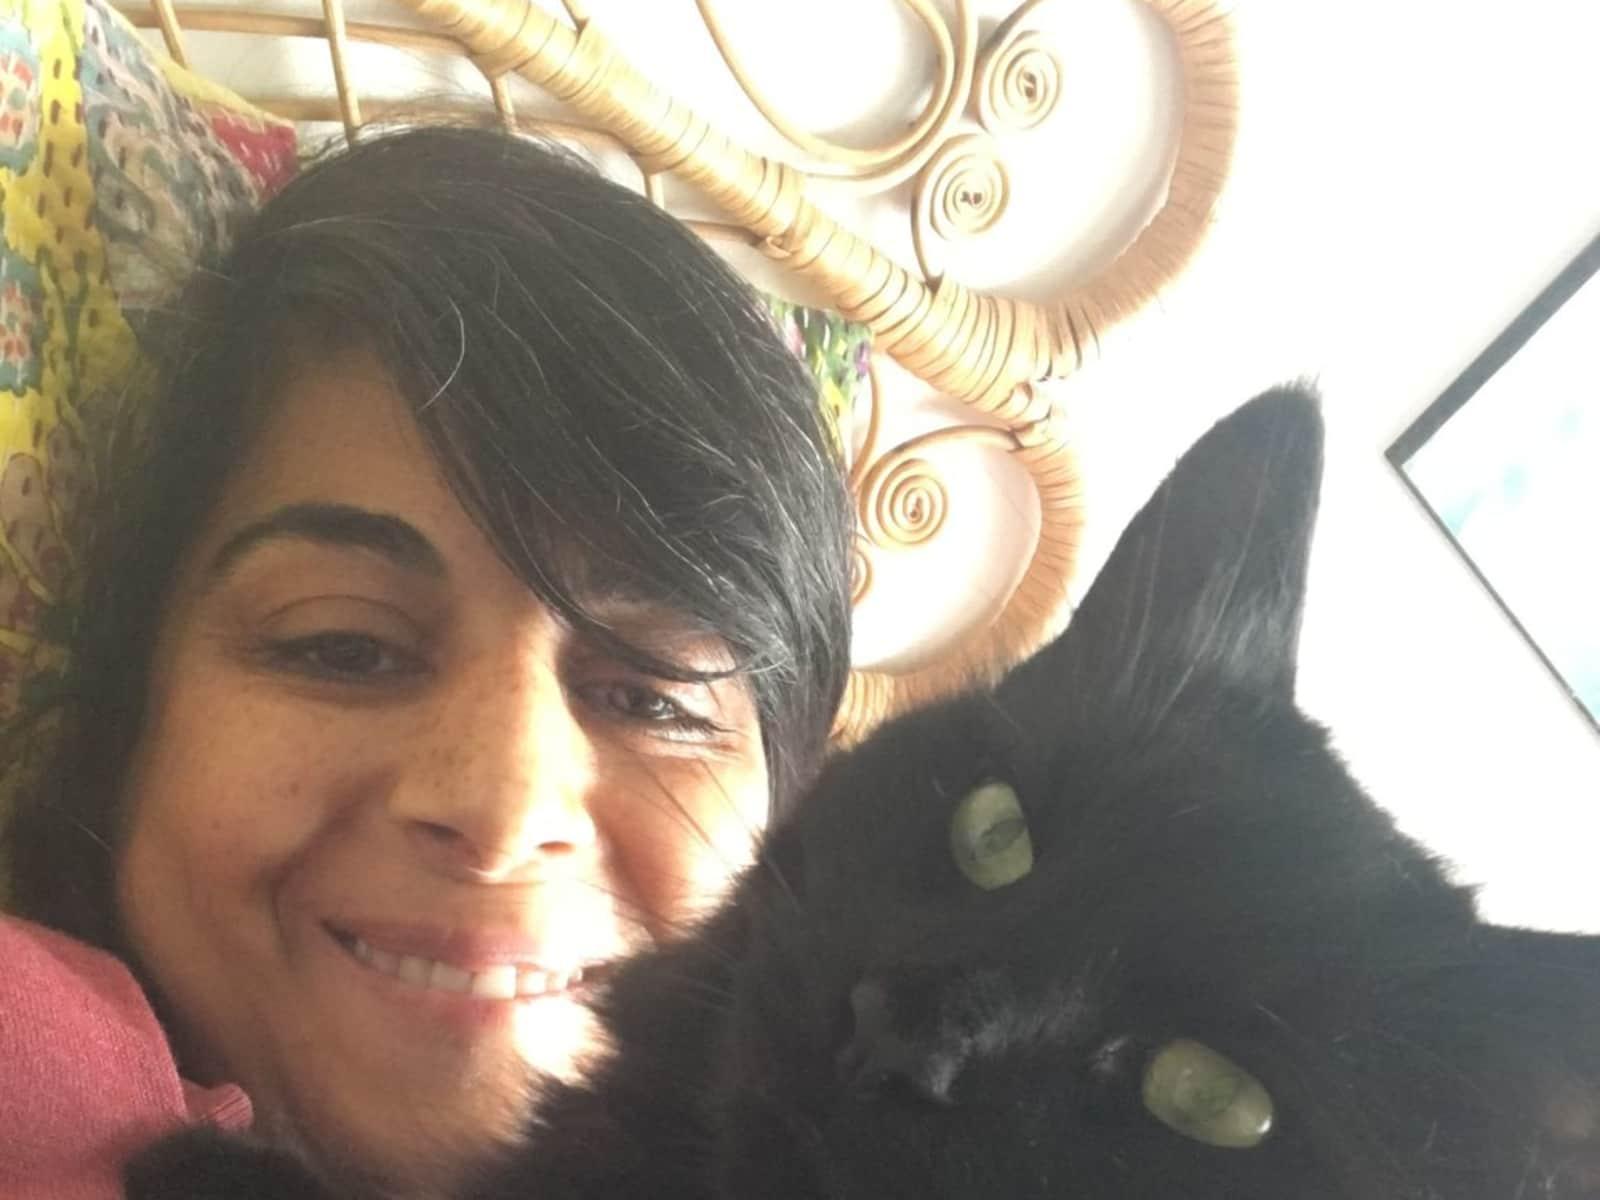 Saiqa from Birmingham, United Kingdom